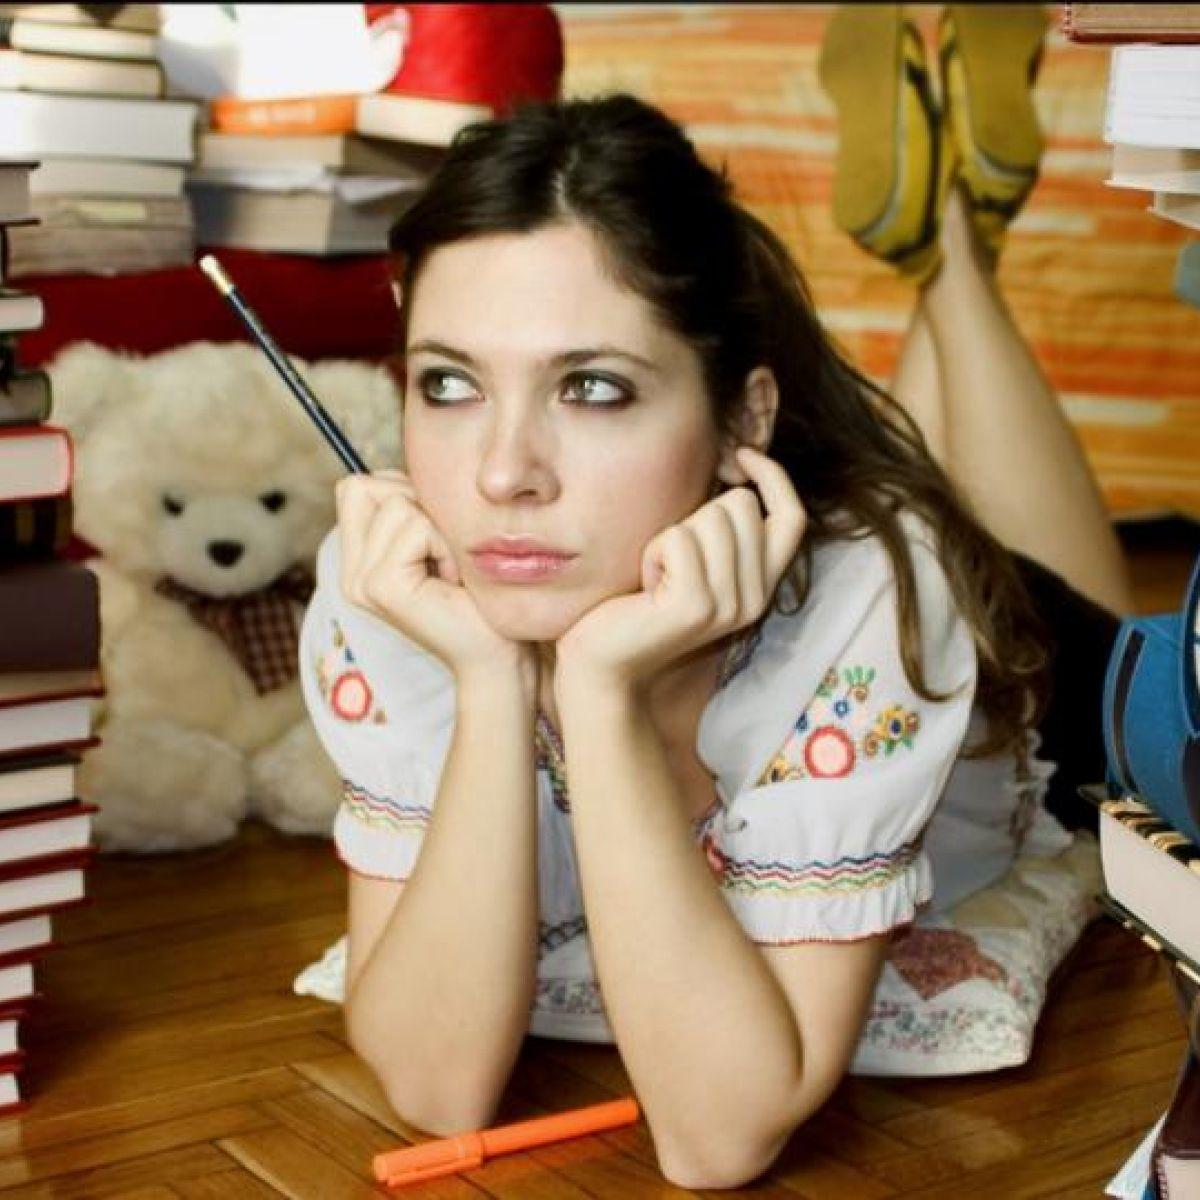 100 Top Tips For Exam Success Images, Photos, Reviews